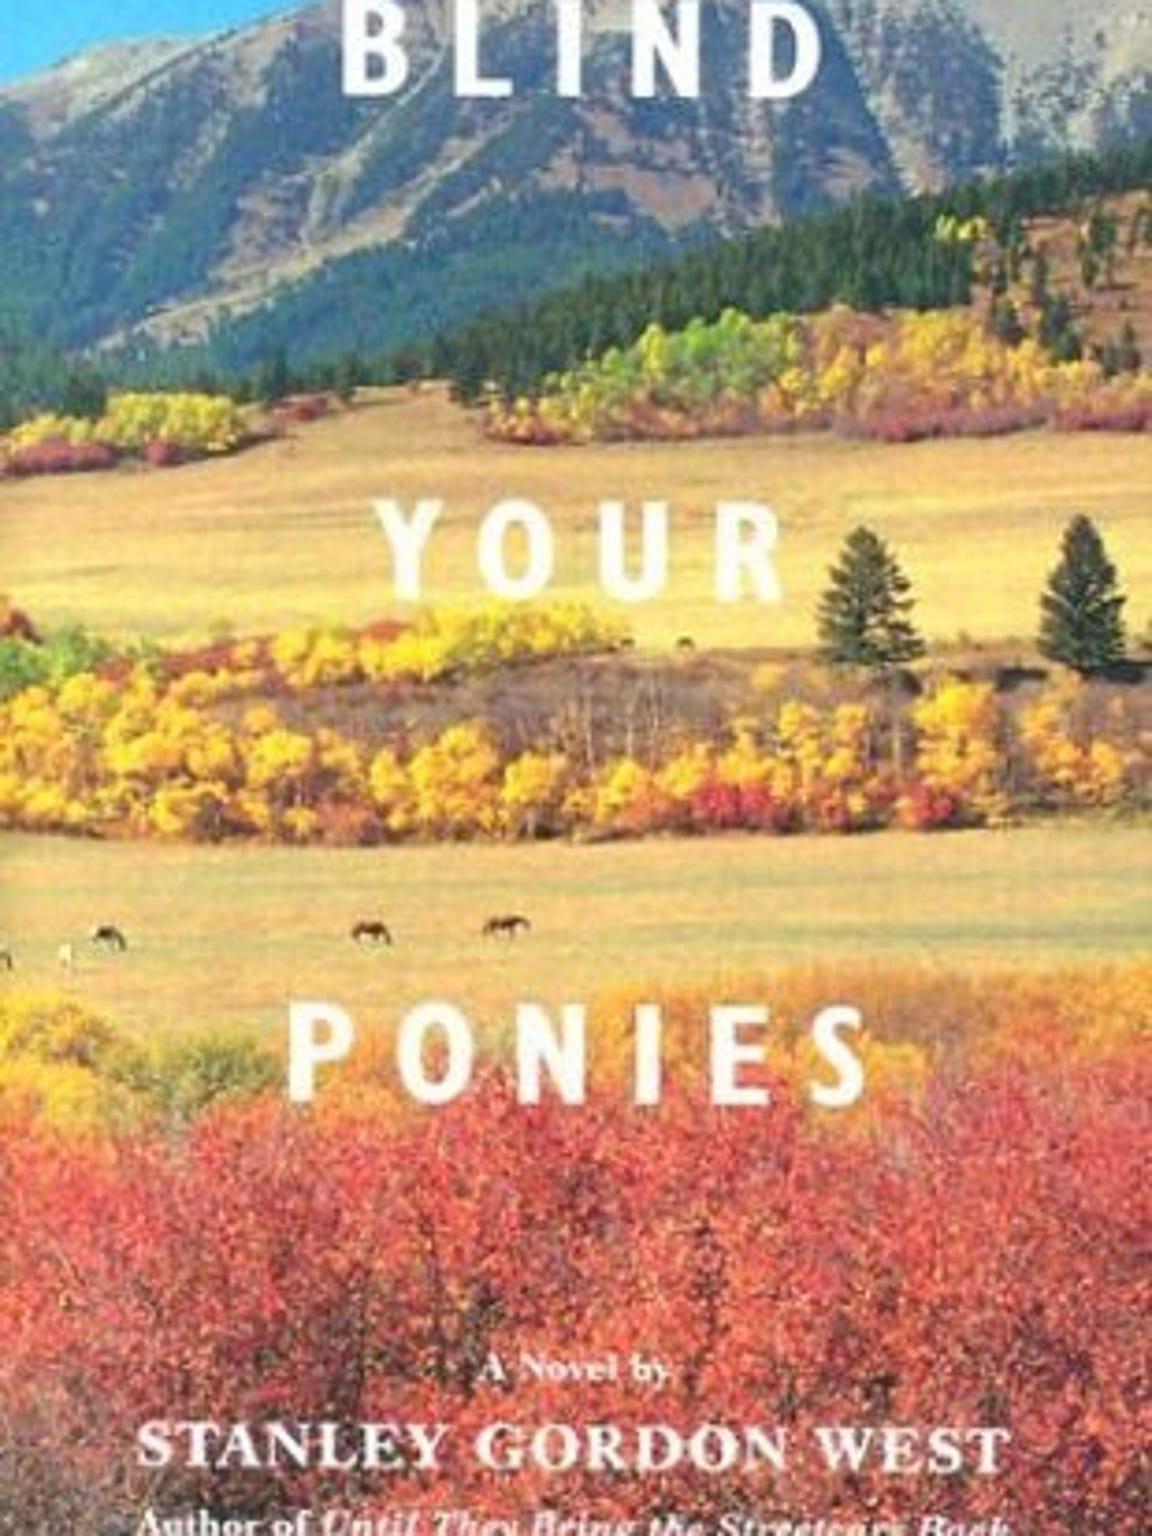 """Blind Your Ponies"""